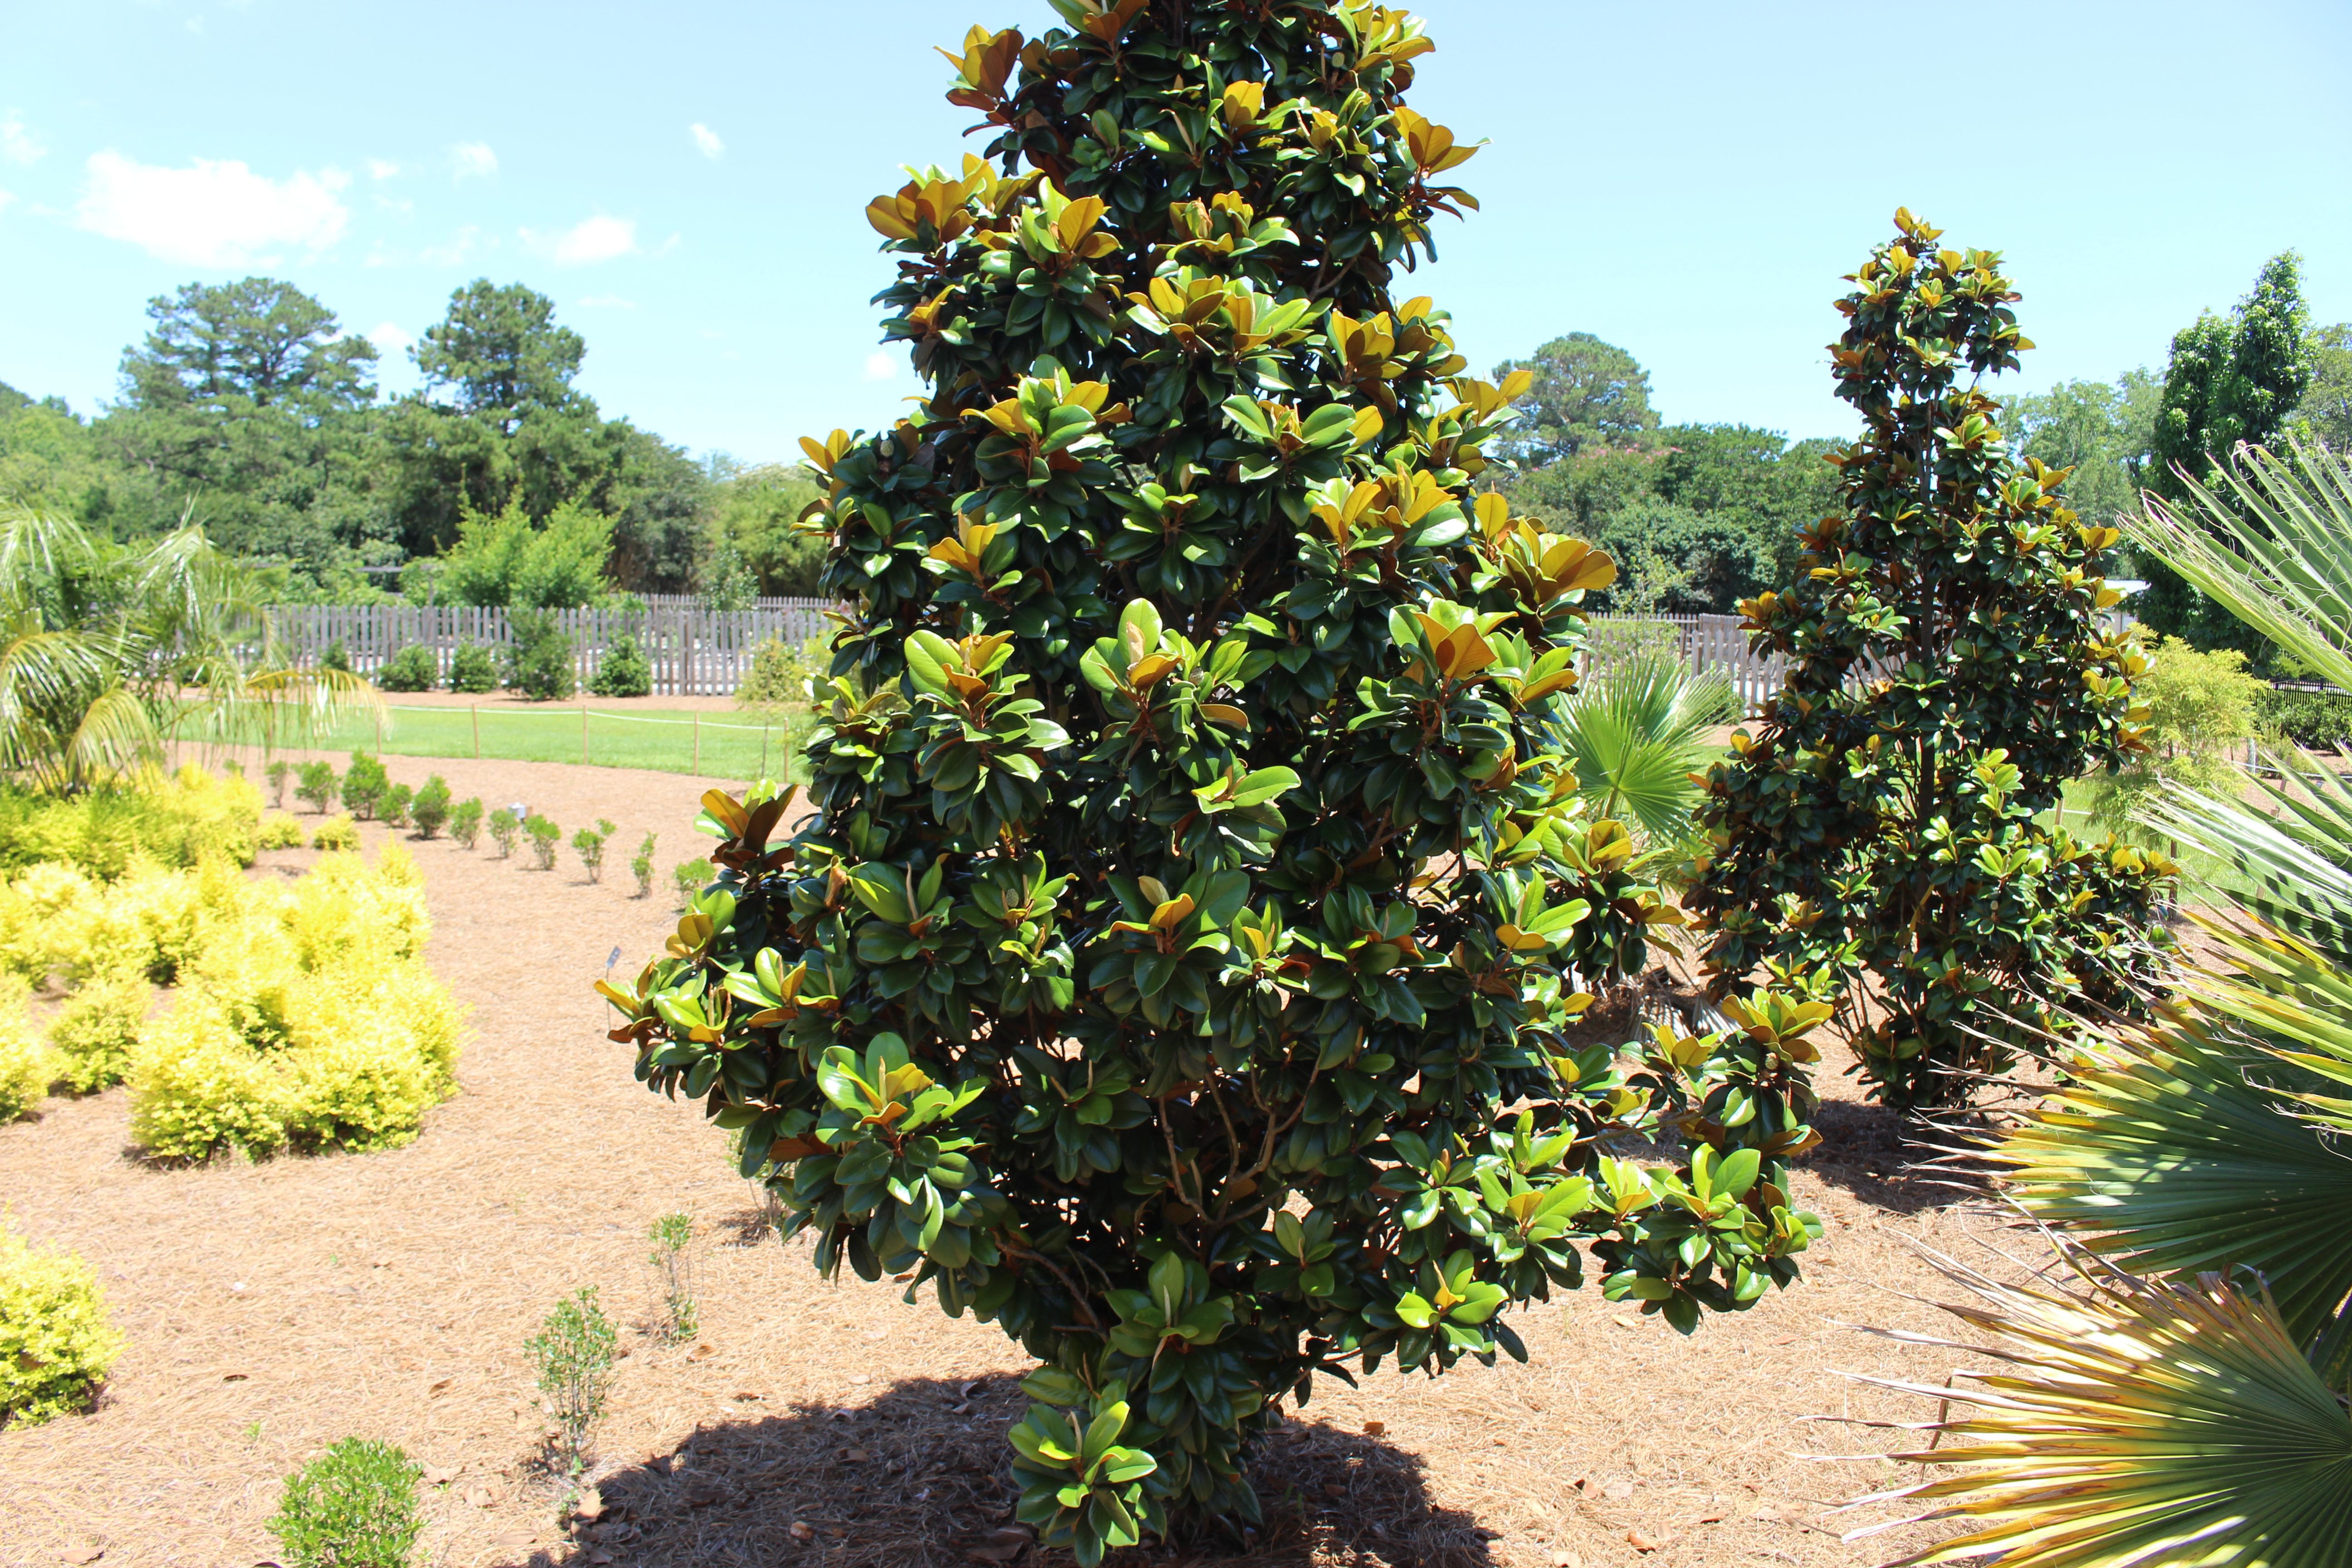 Filecoastal Georgia Botanical Gardens Teddy Bear Southern Magnolia